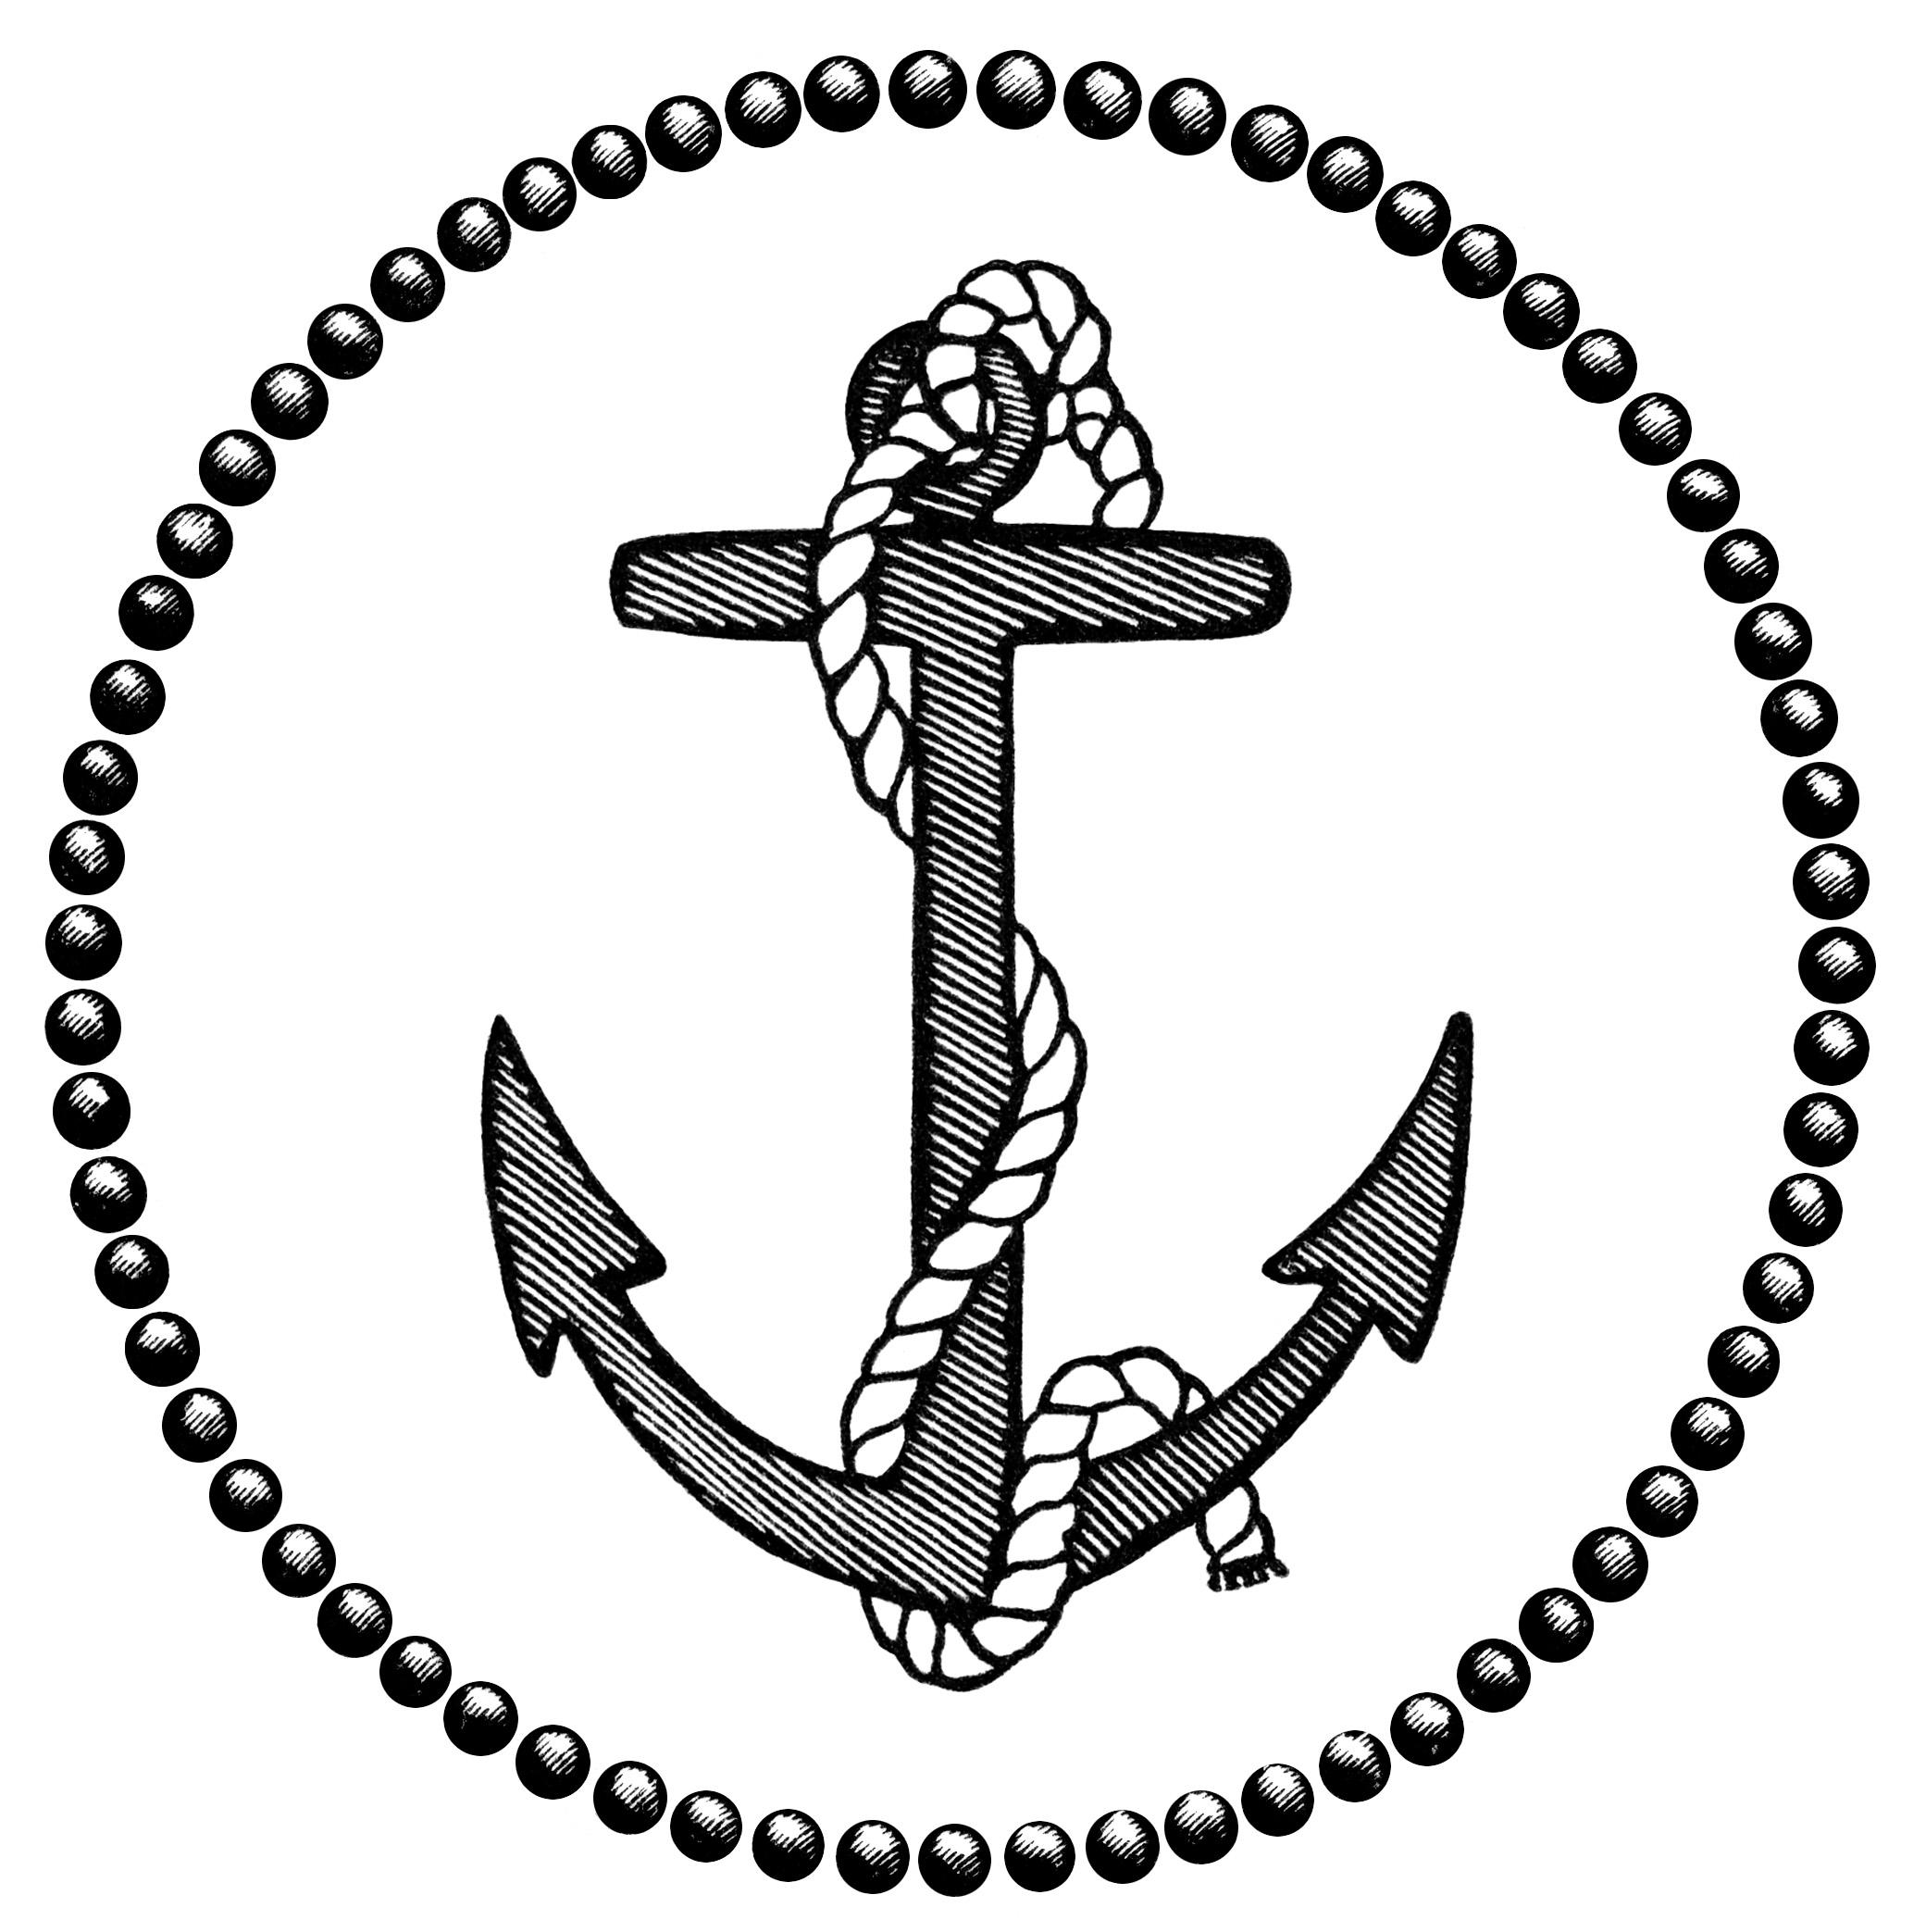 Anchors Anchor Drawings And